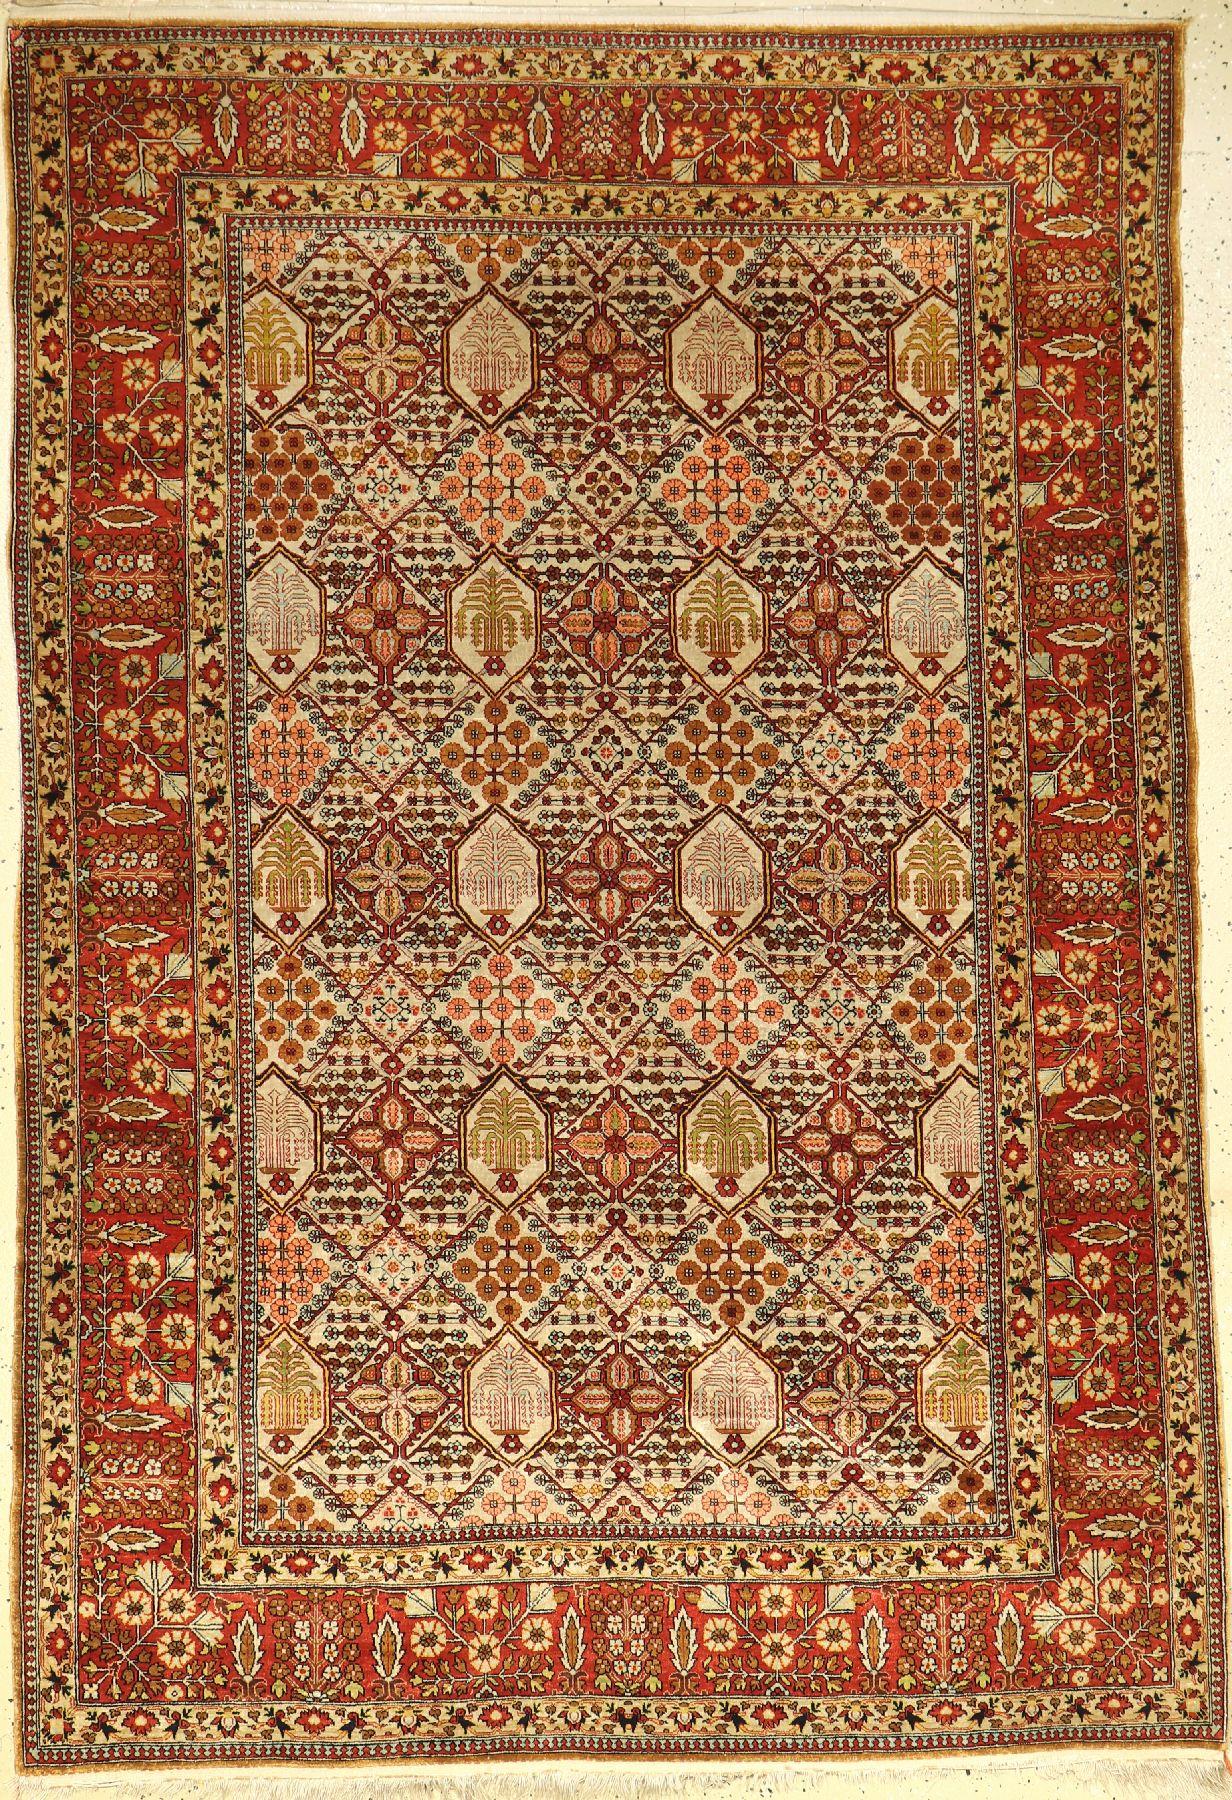 Seiden Ghom alt, Persien, um 1950, reine Naturseide, ca. 207 x 138 cm, selten, hochwertig, EHZ: 2-